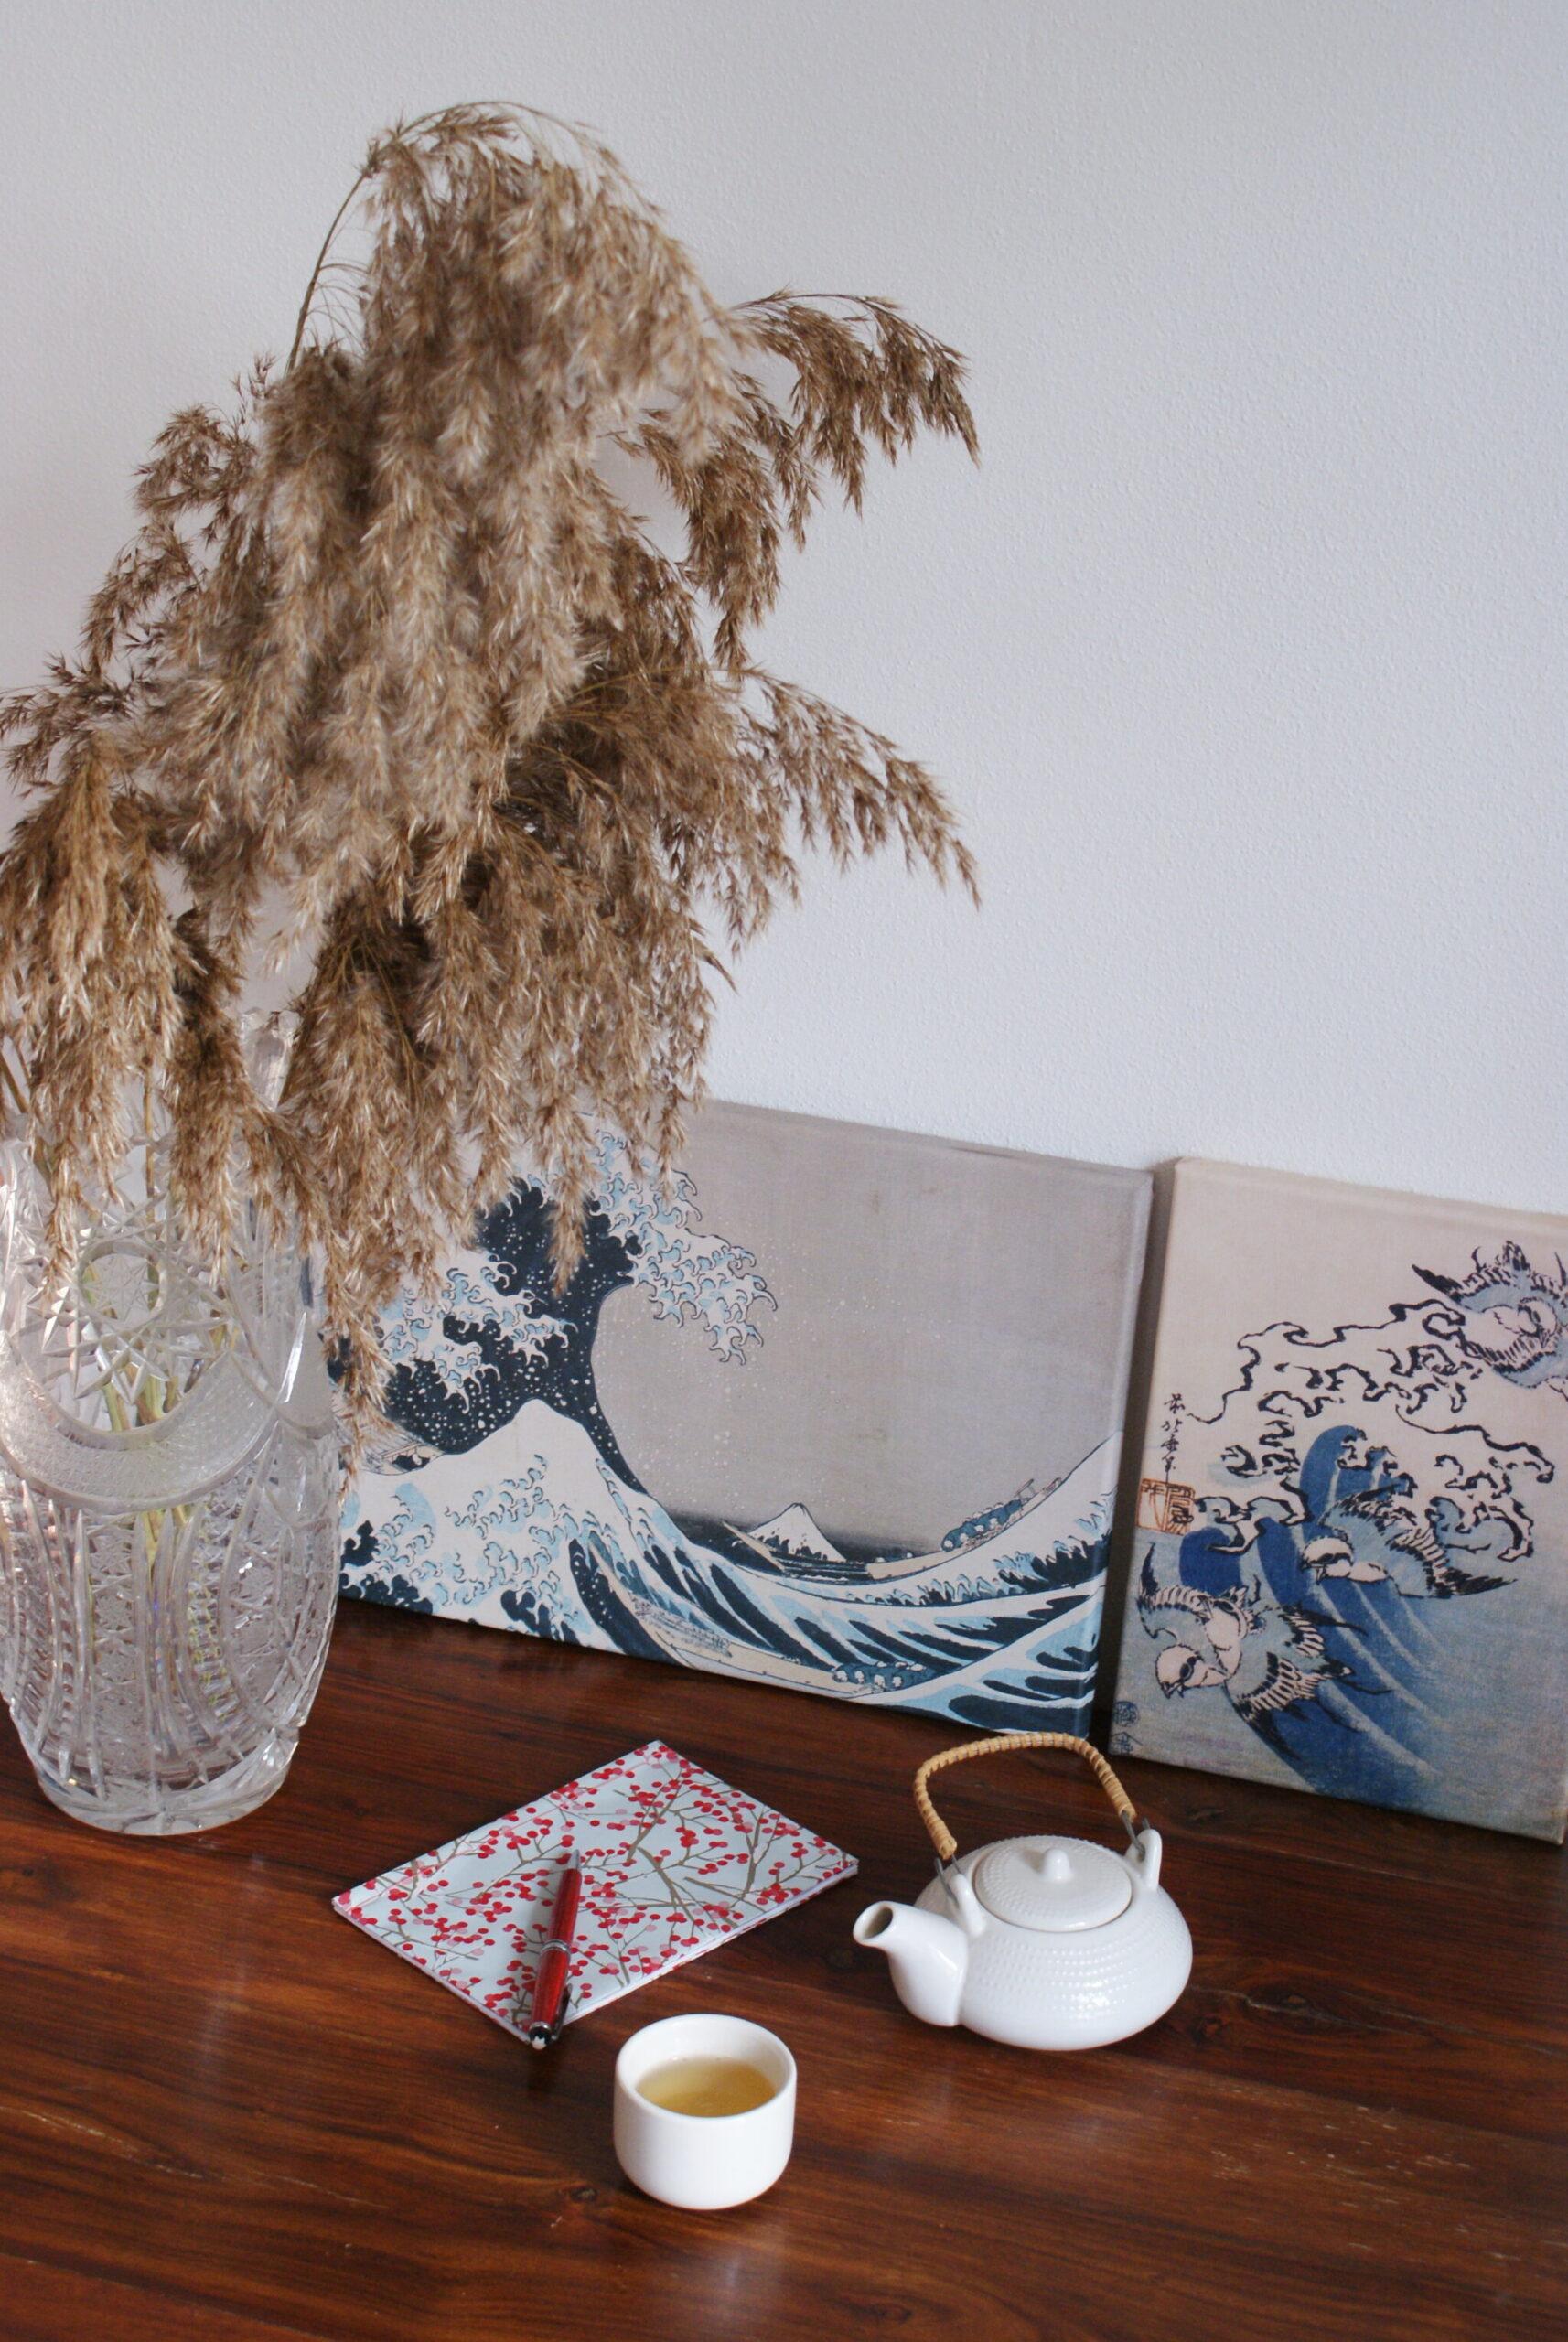 tutorial watoji diy handmade rilegatura giapponese fai da te quaderno libro carta francinesplaceblog